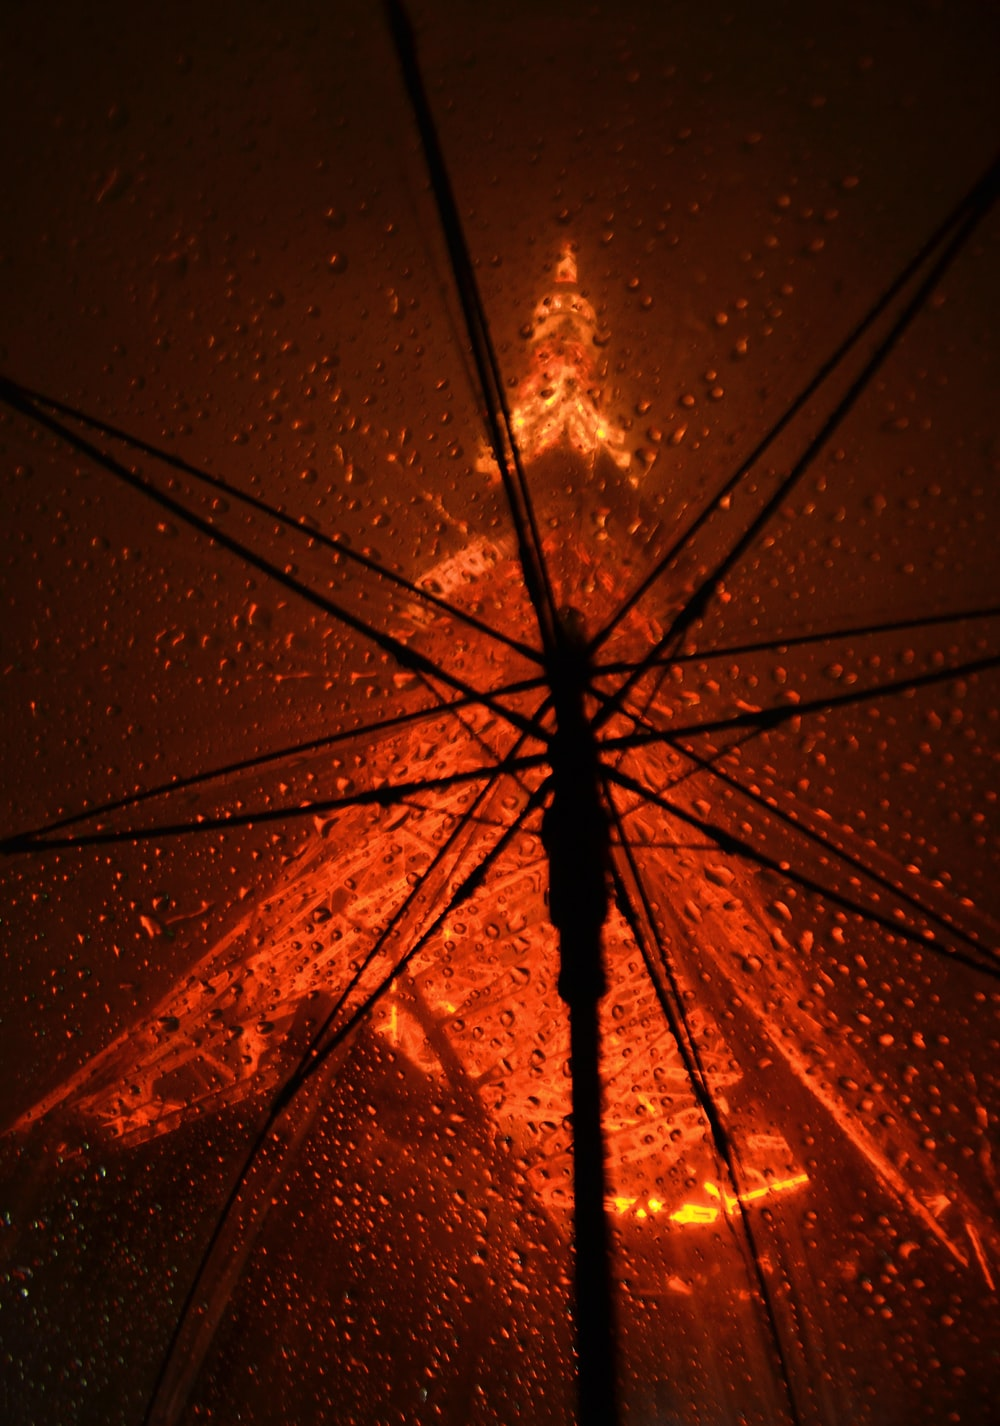 orange umbrella with drops